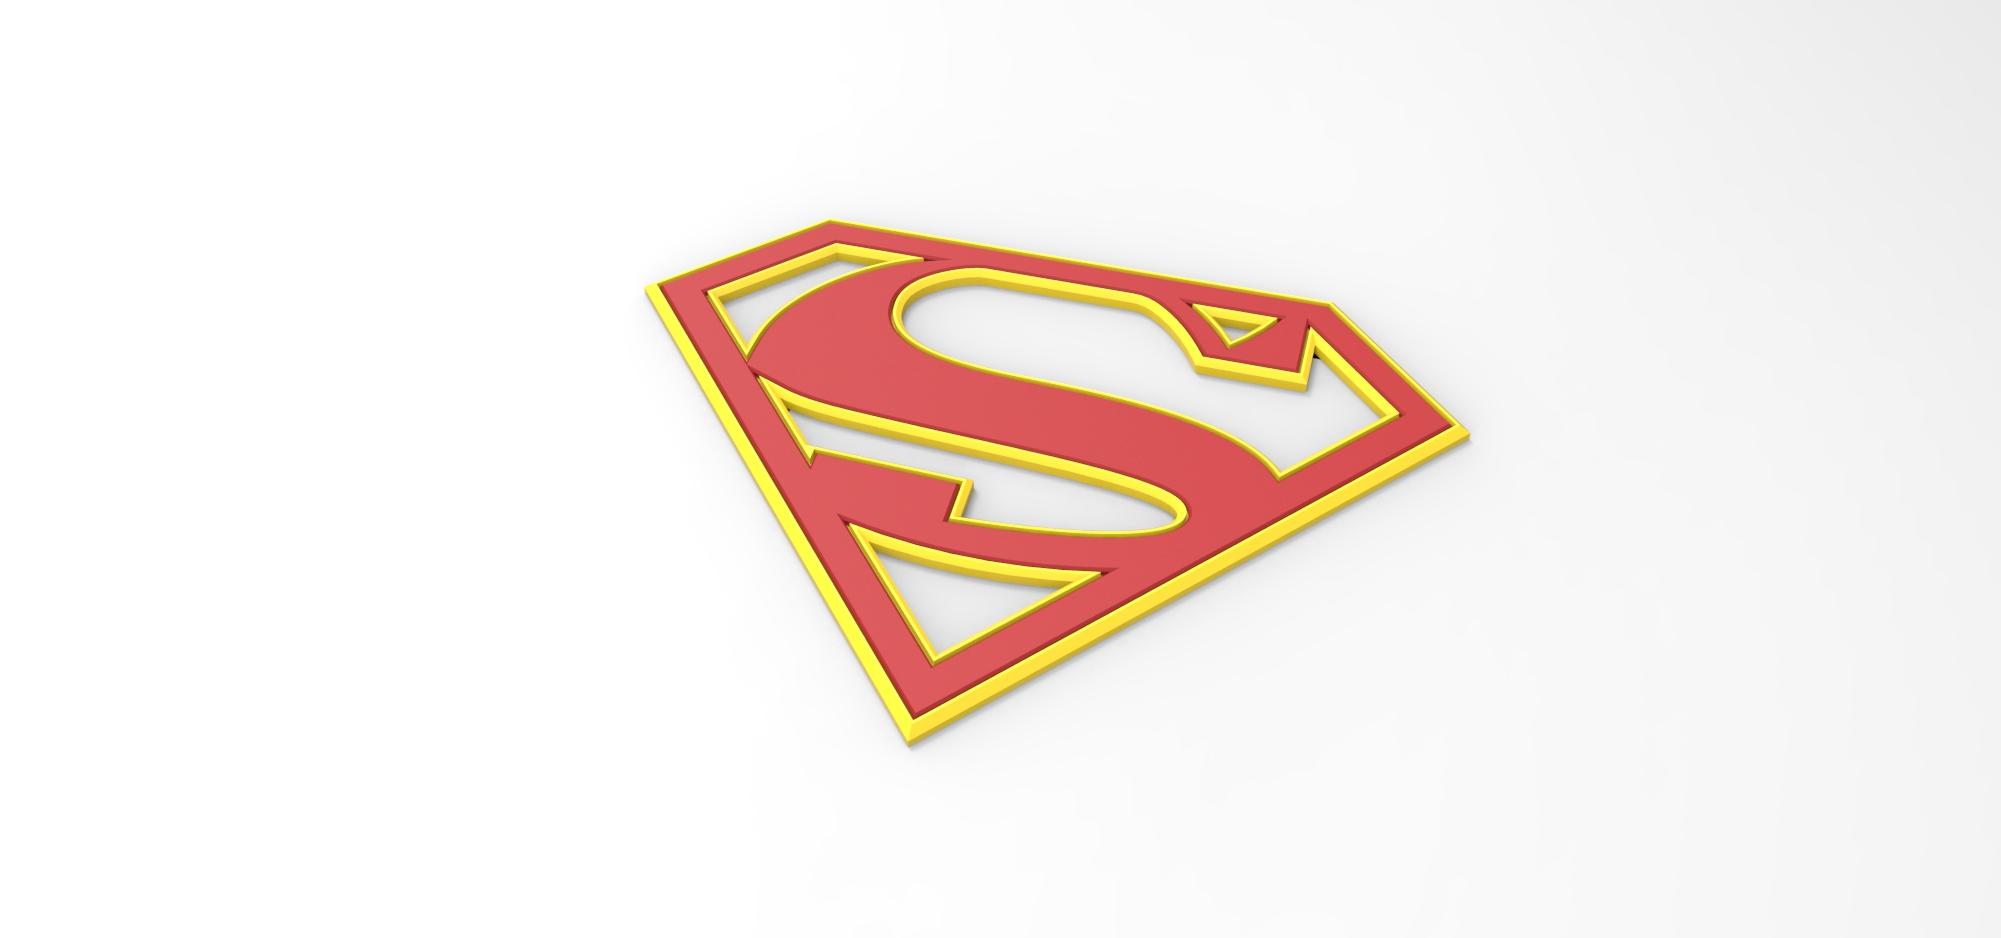 graphic relating to Supergirl Logo Printable named 3D printable Supergirl logo for cosplay dress